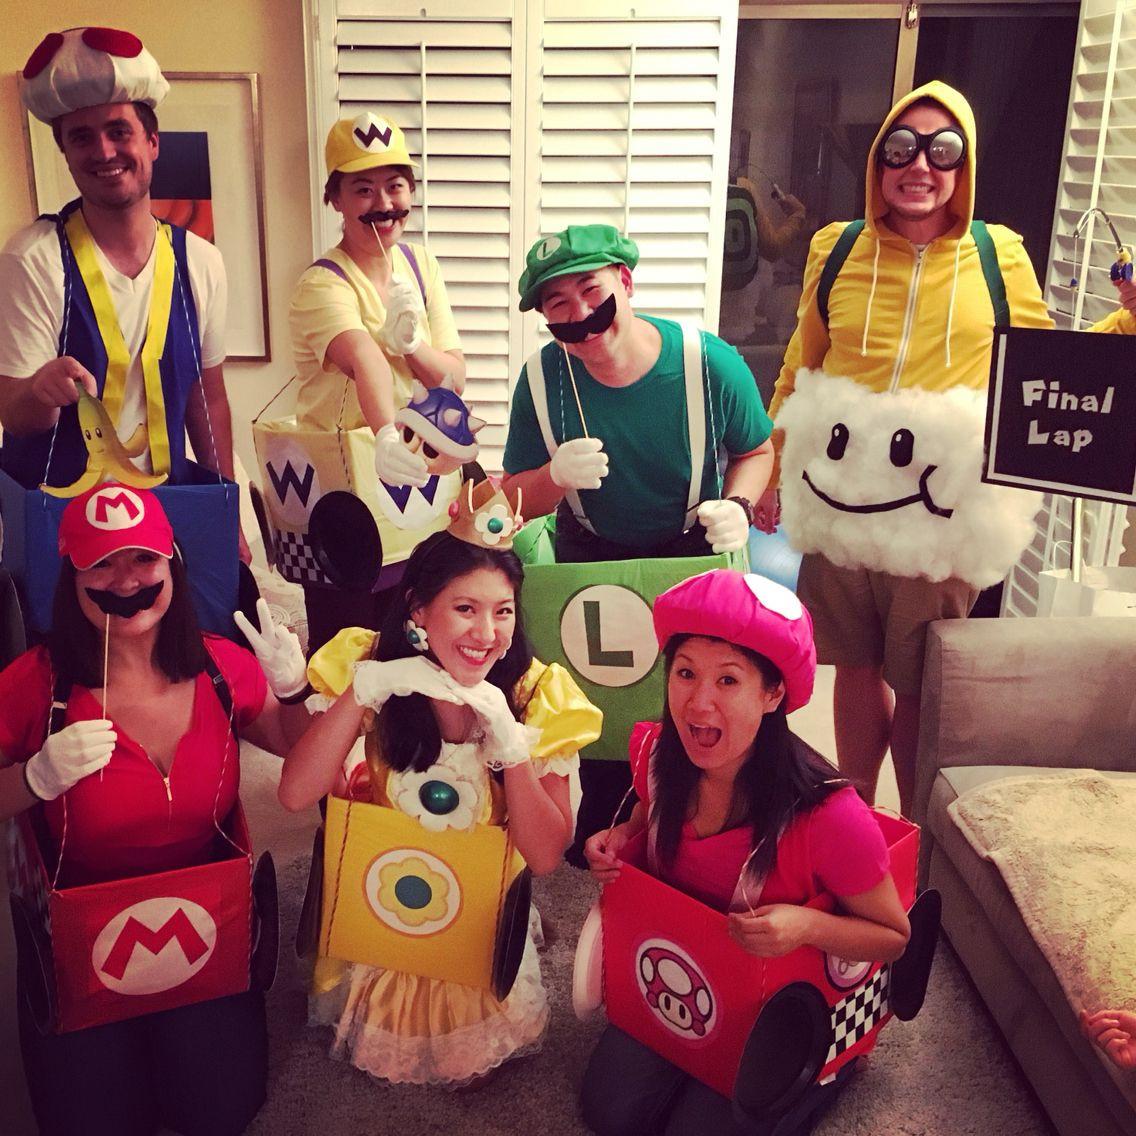 Best ideas about Wario Costume DIY . Save or Pin Group costume idea Mario Kart Luigi Mario Princess Now.